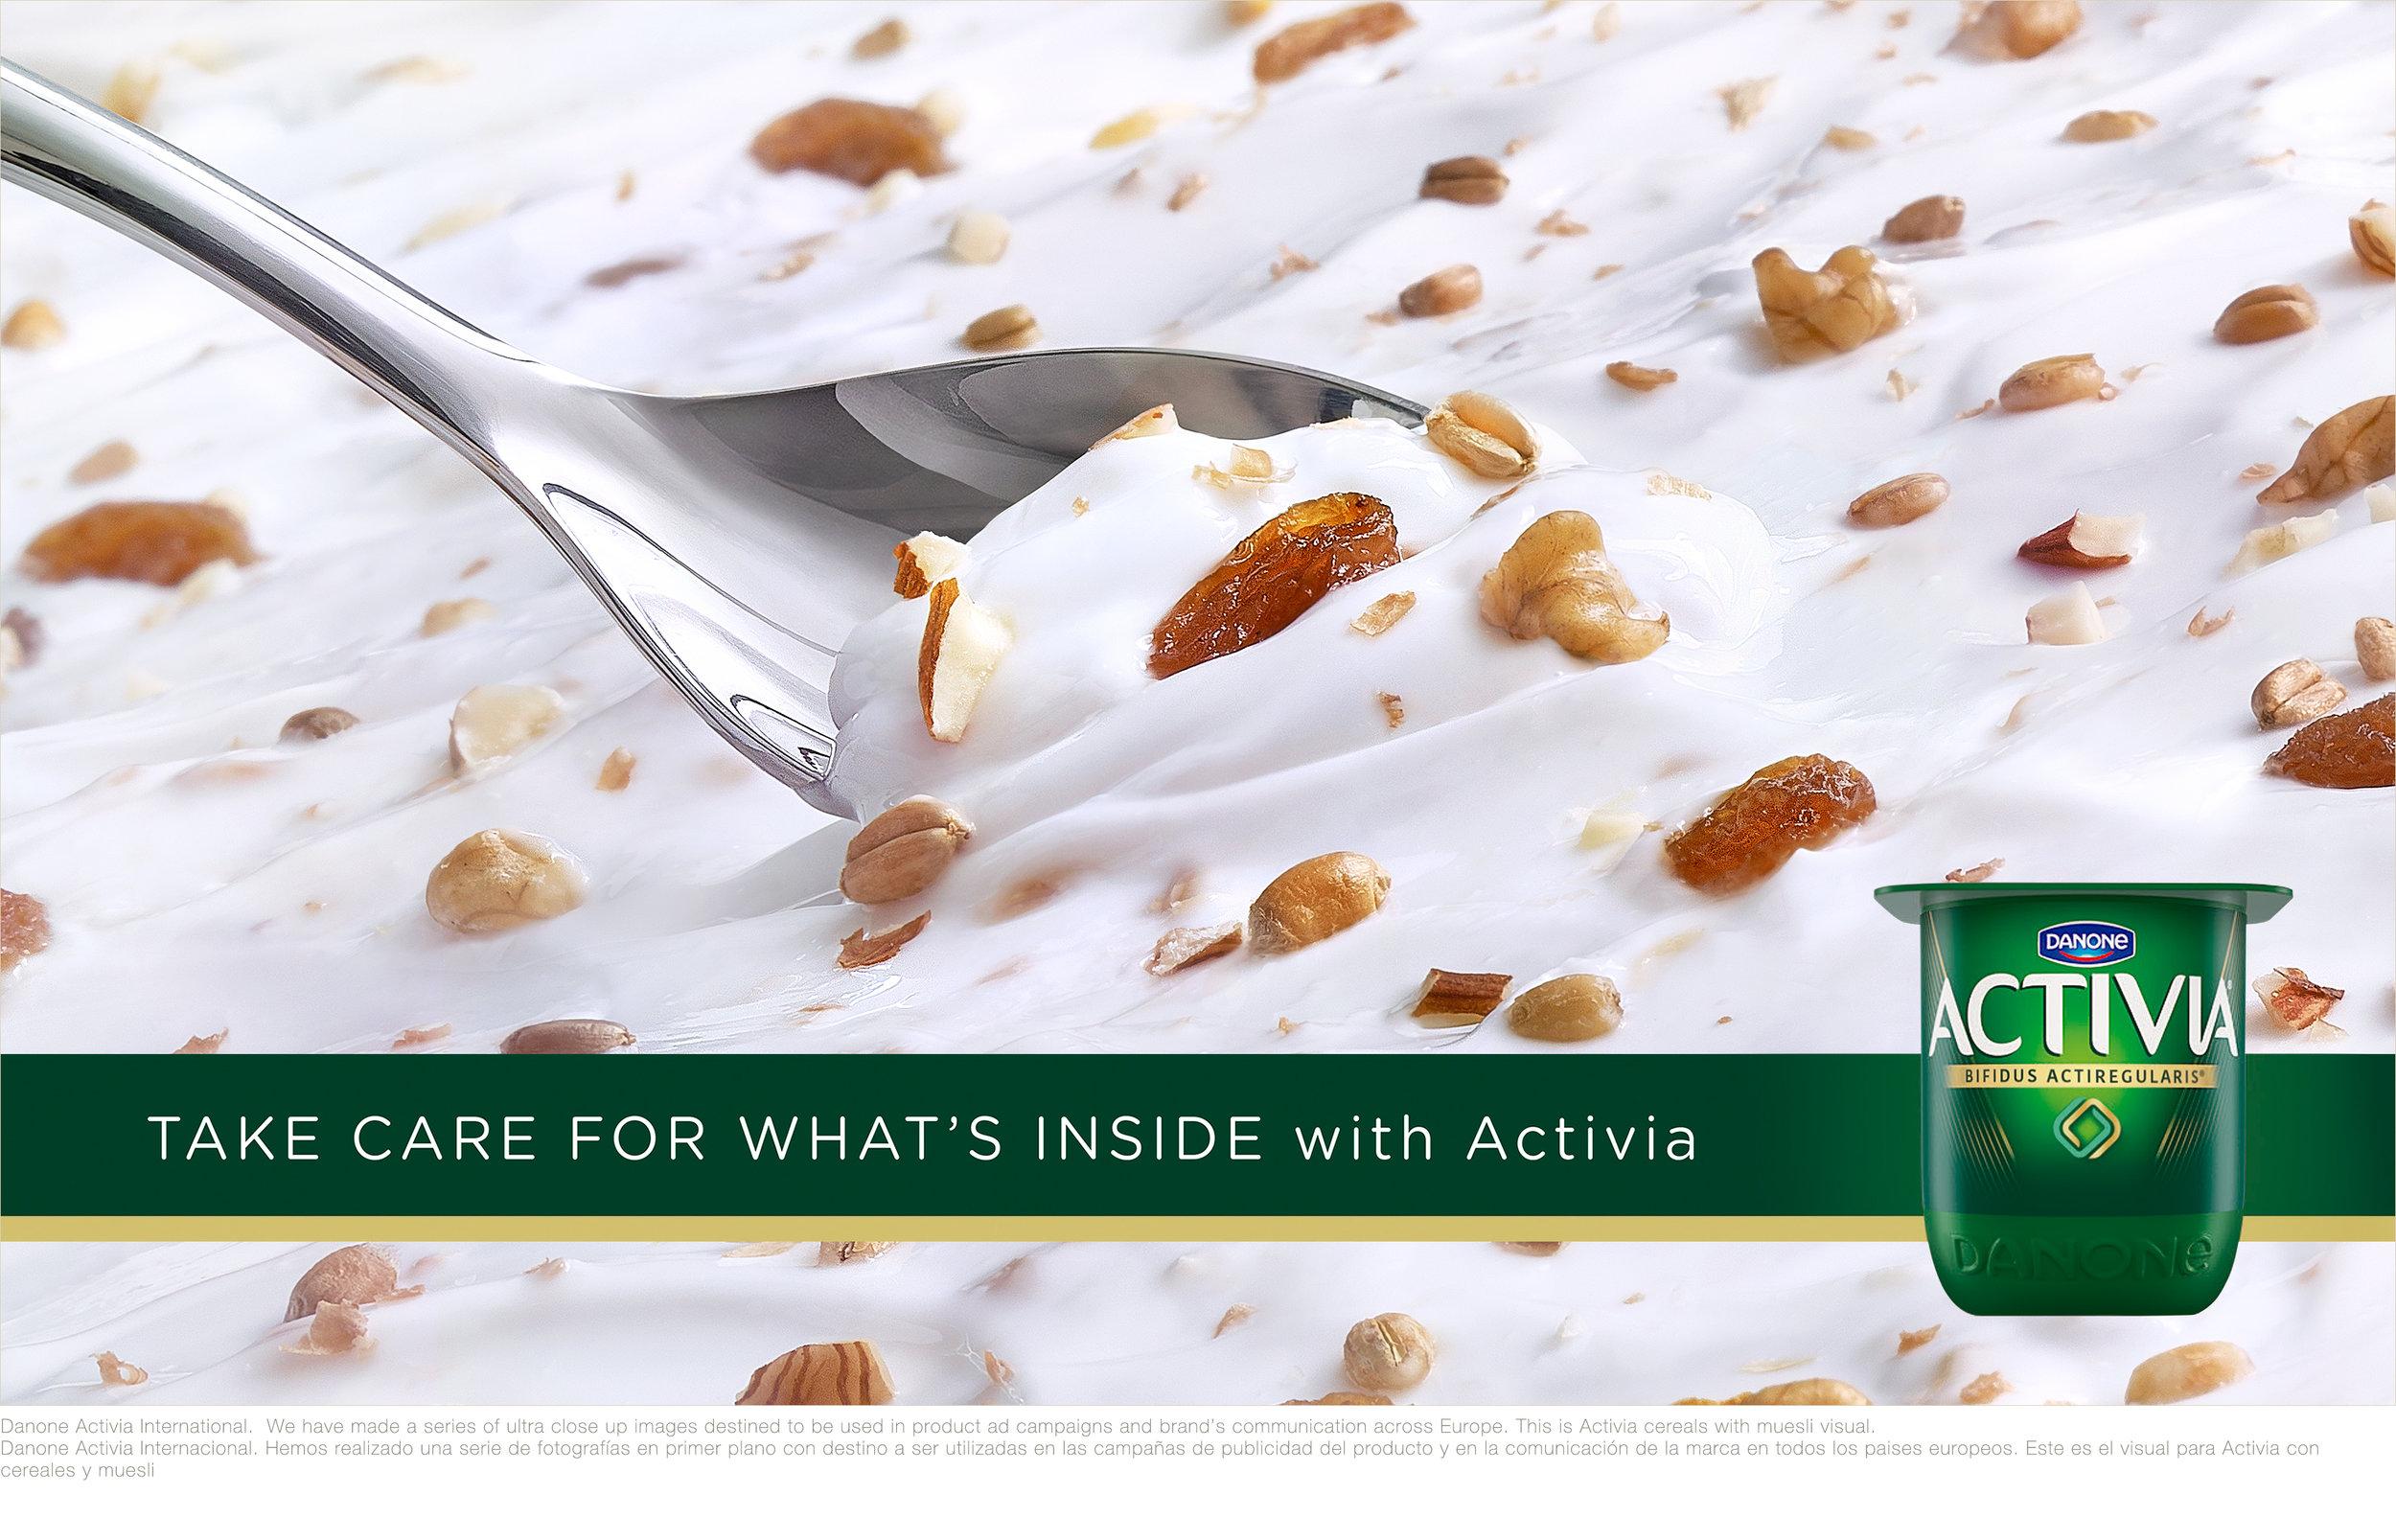 1723c-Activia-INT-Muesli-04-With-Walnuts-01.jpg